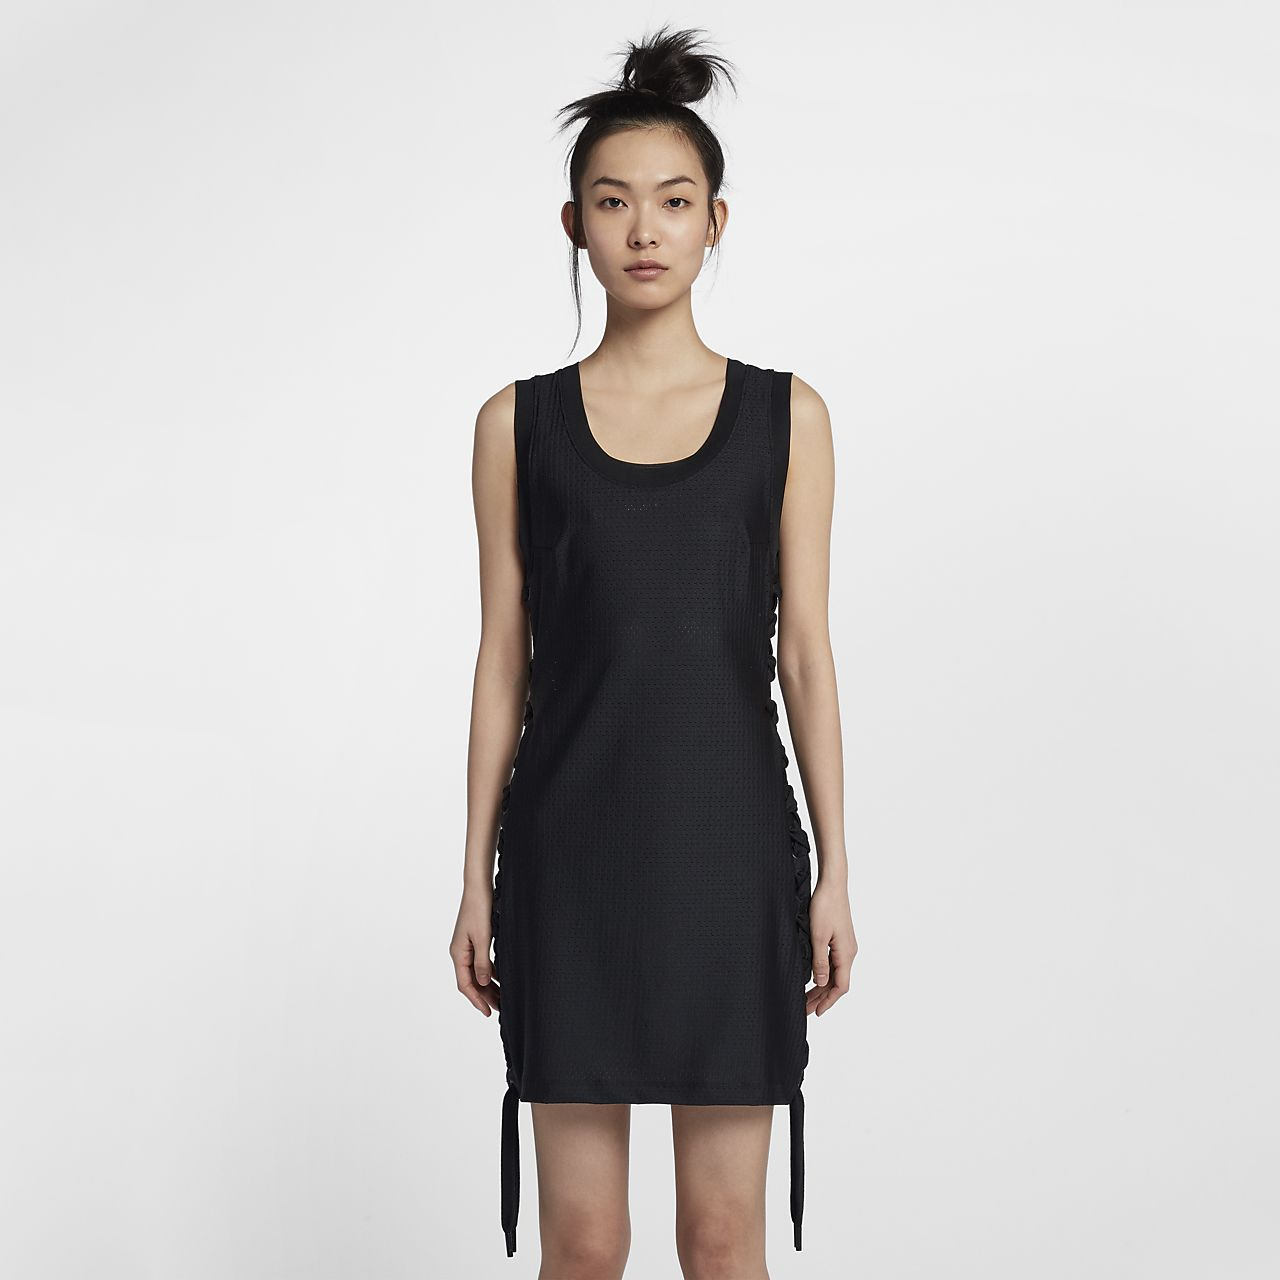 Nike x RT Women's Jersey Dress